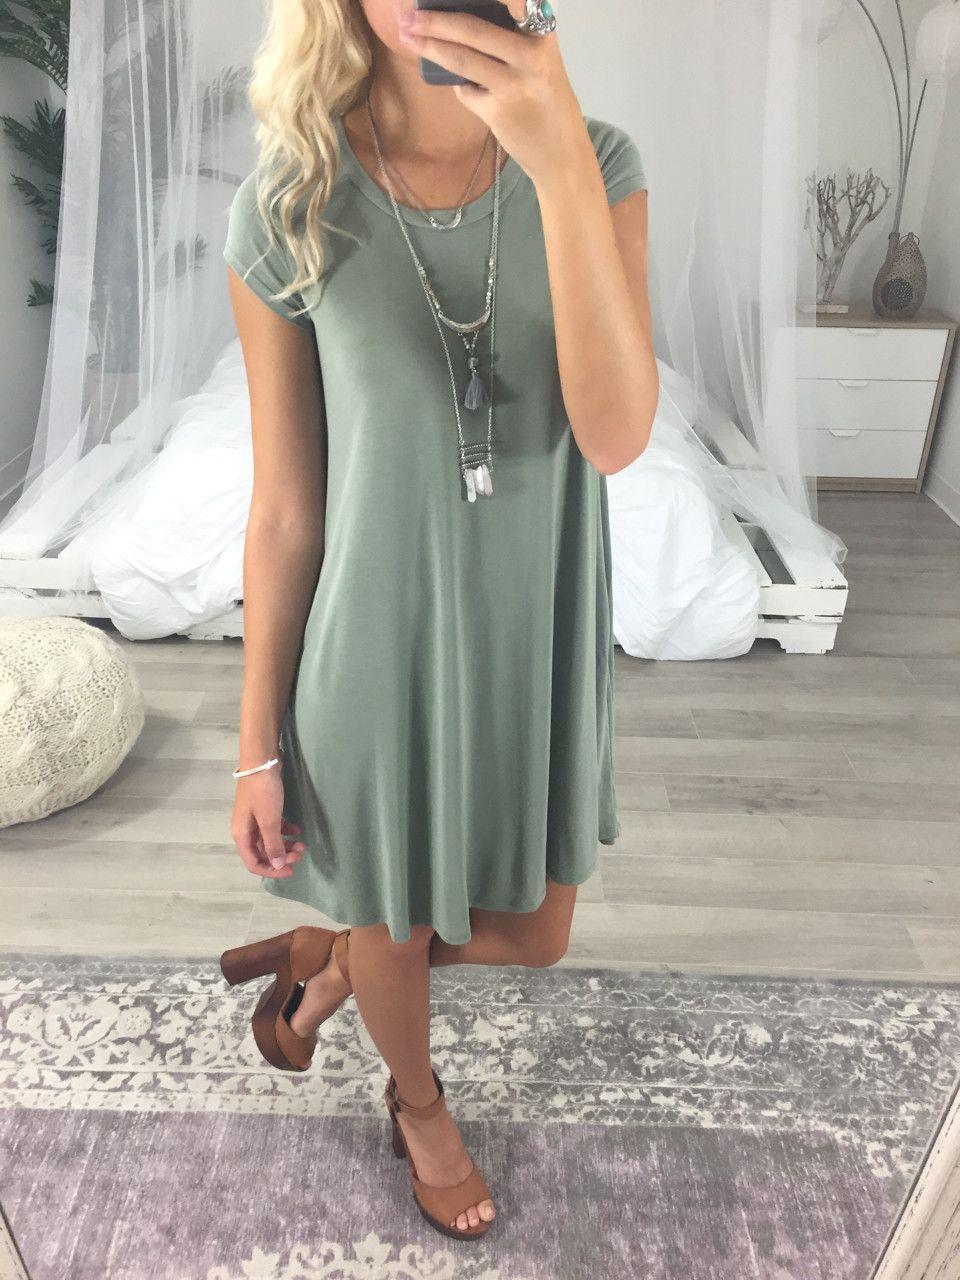 Lipari Islands Olive Short Sleeve T Shirt Dress Stylish Summer Outfits Pastel Green Dress Style [ 1280 x 960 Pixel ]